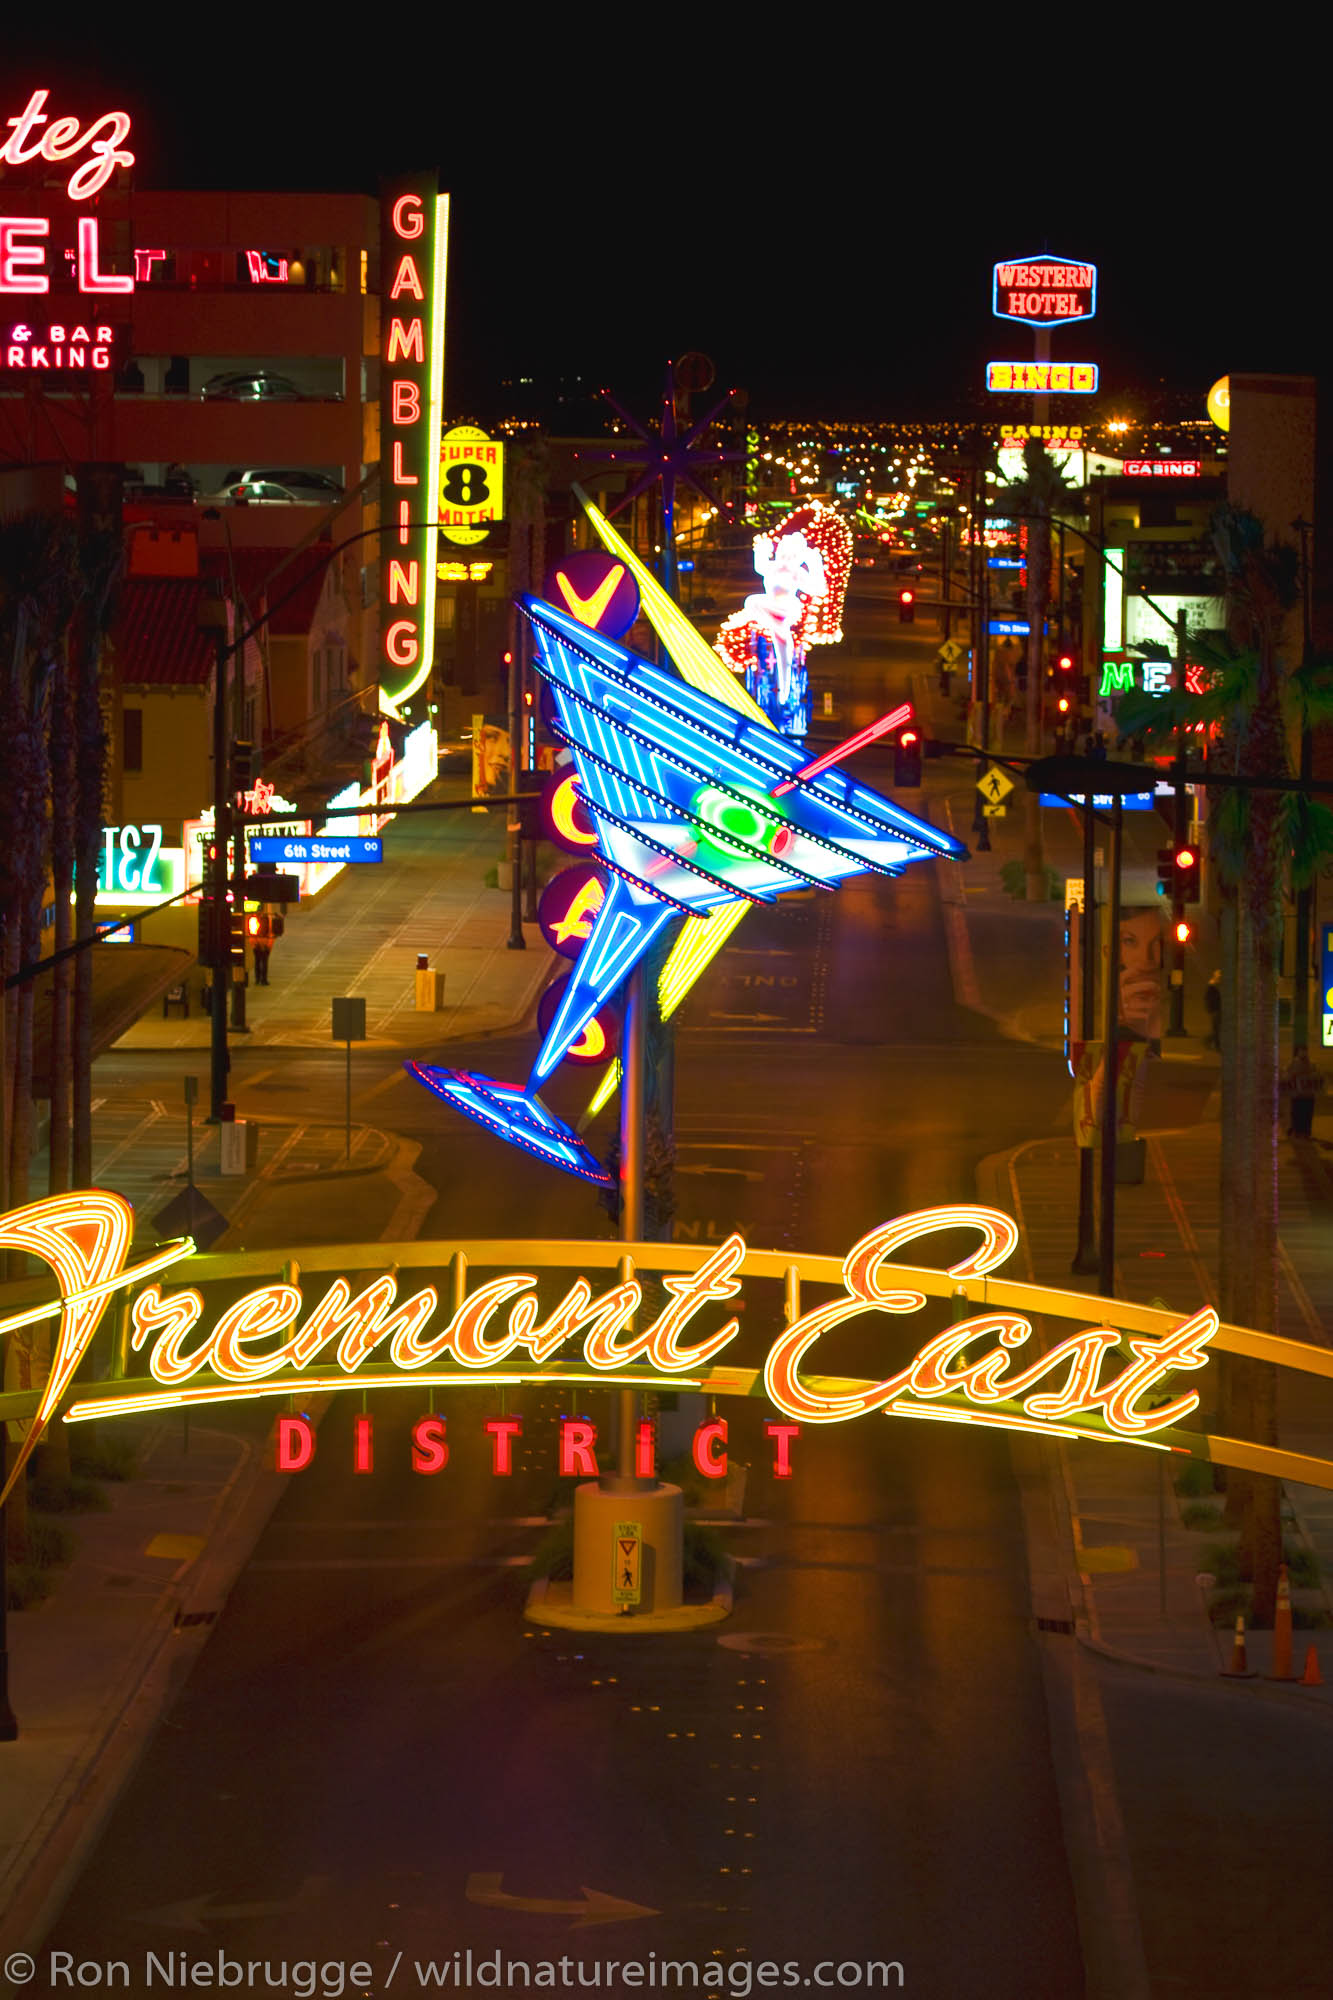 Fremont East, Downtown Las Vegas, Nevada.